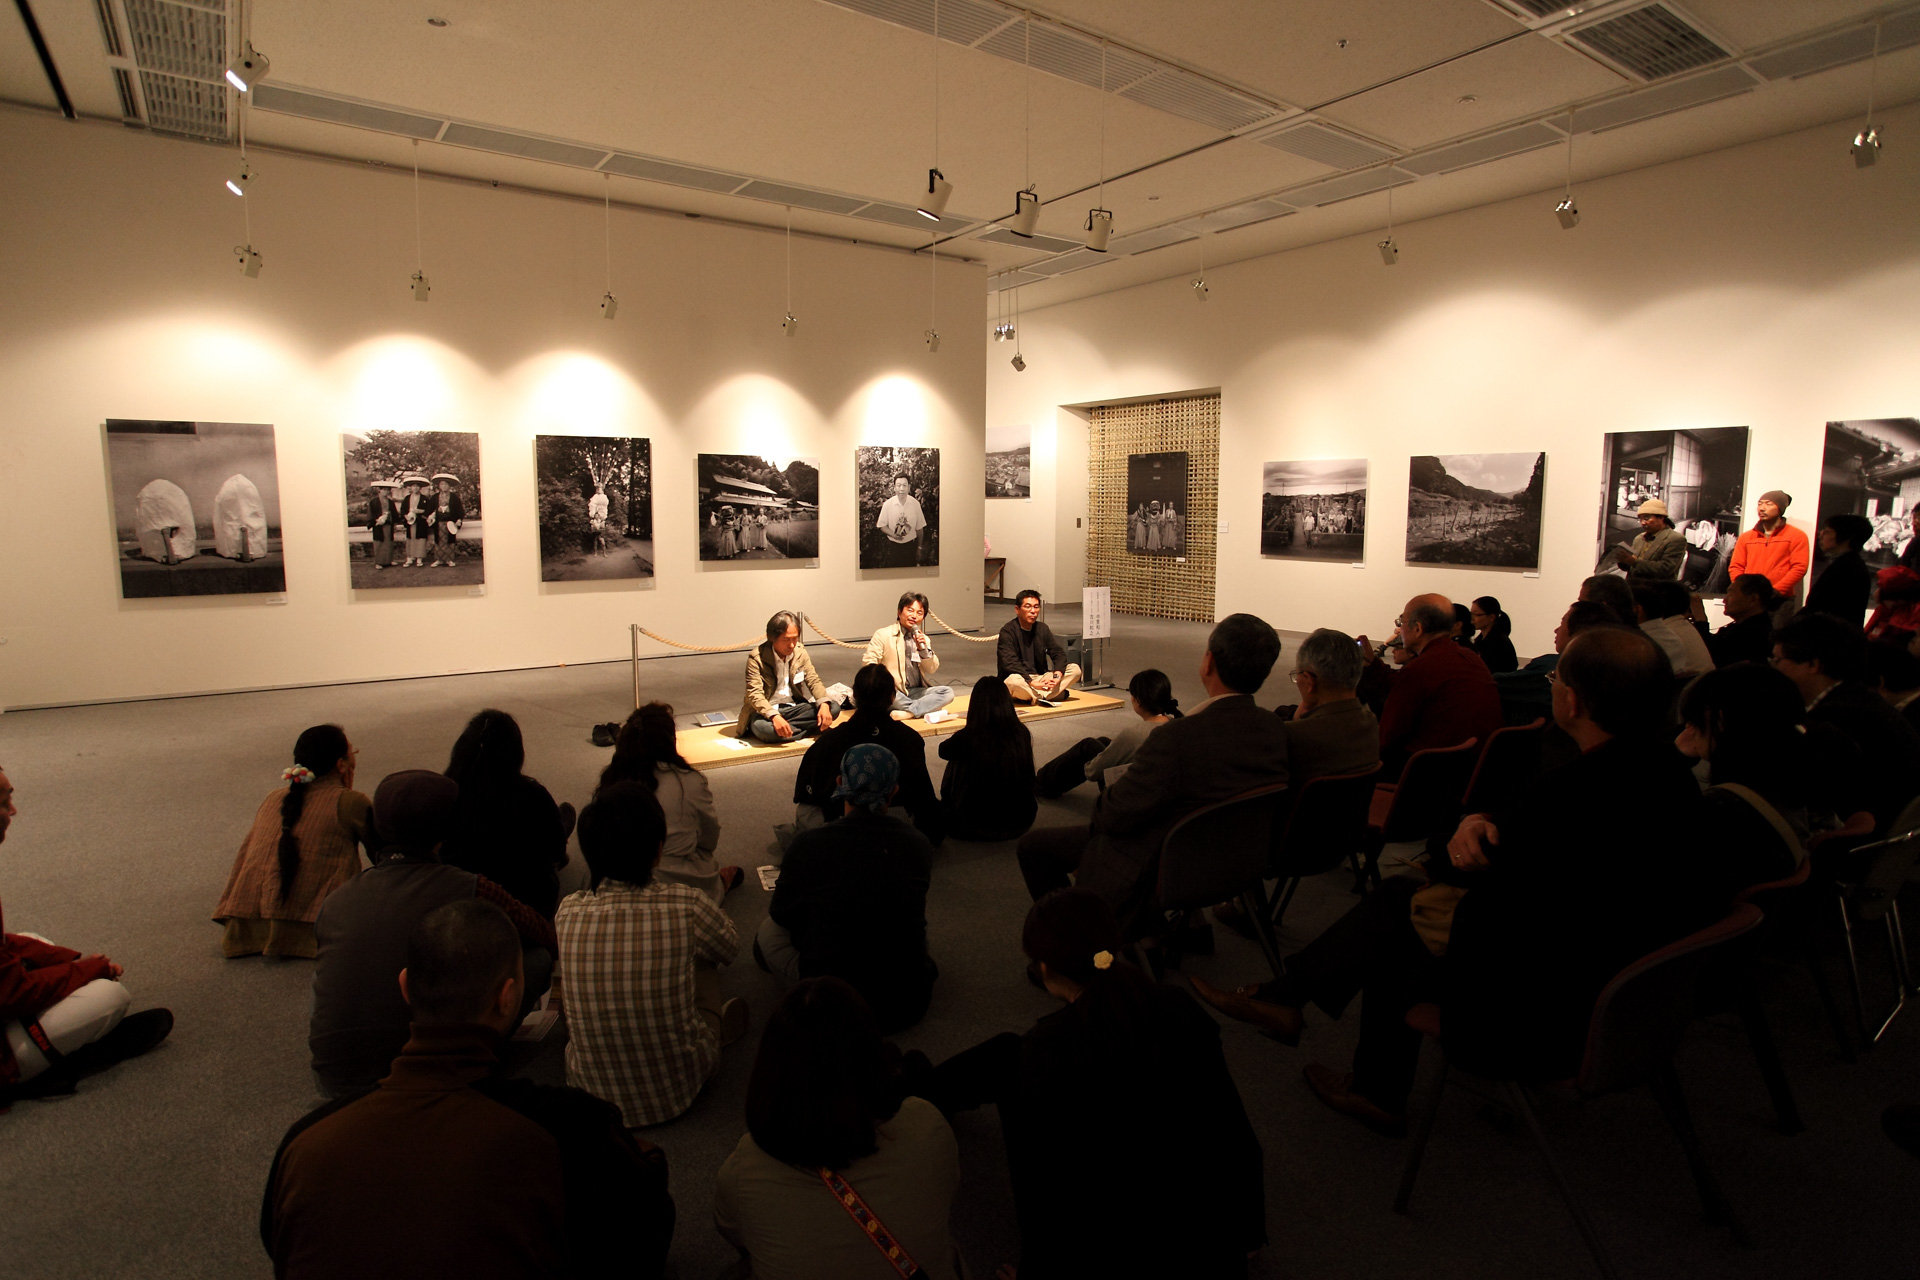 20100322松原豊写真展村の記憶/中里和人×吉川和之×松原豊トークショー